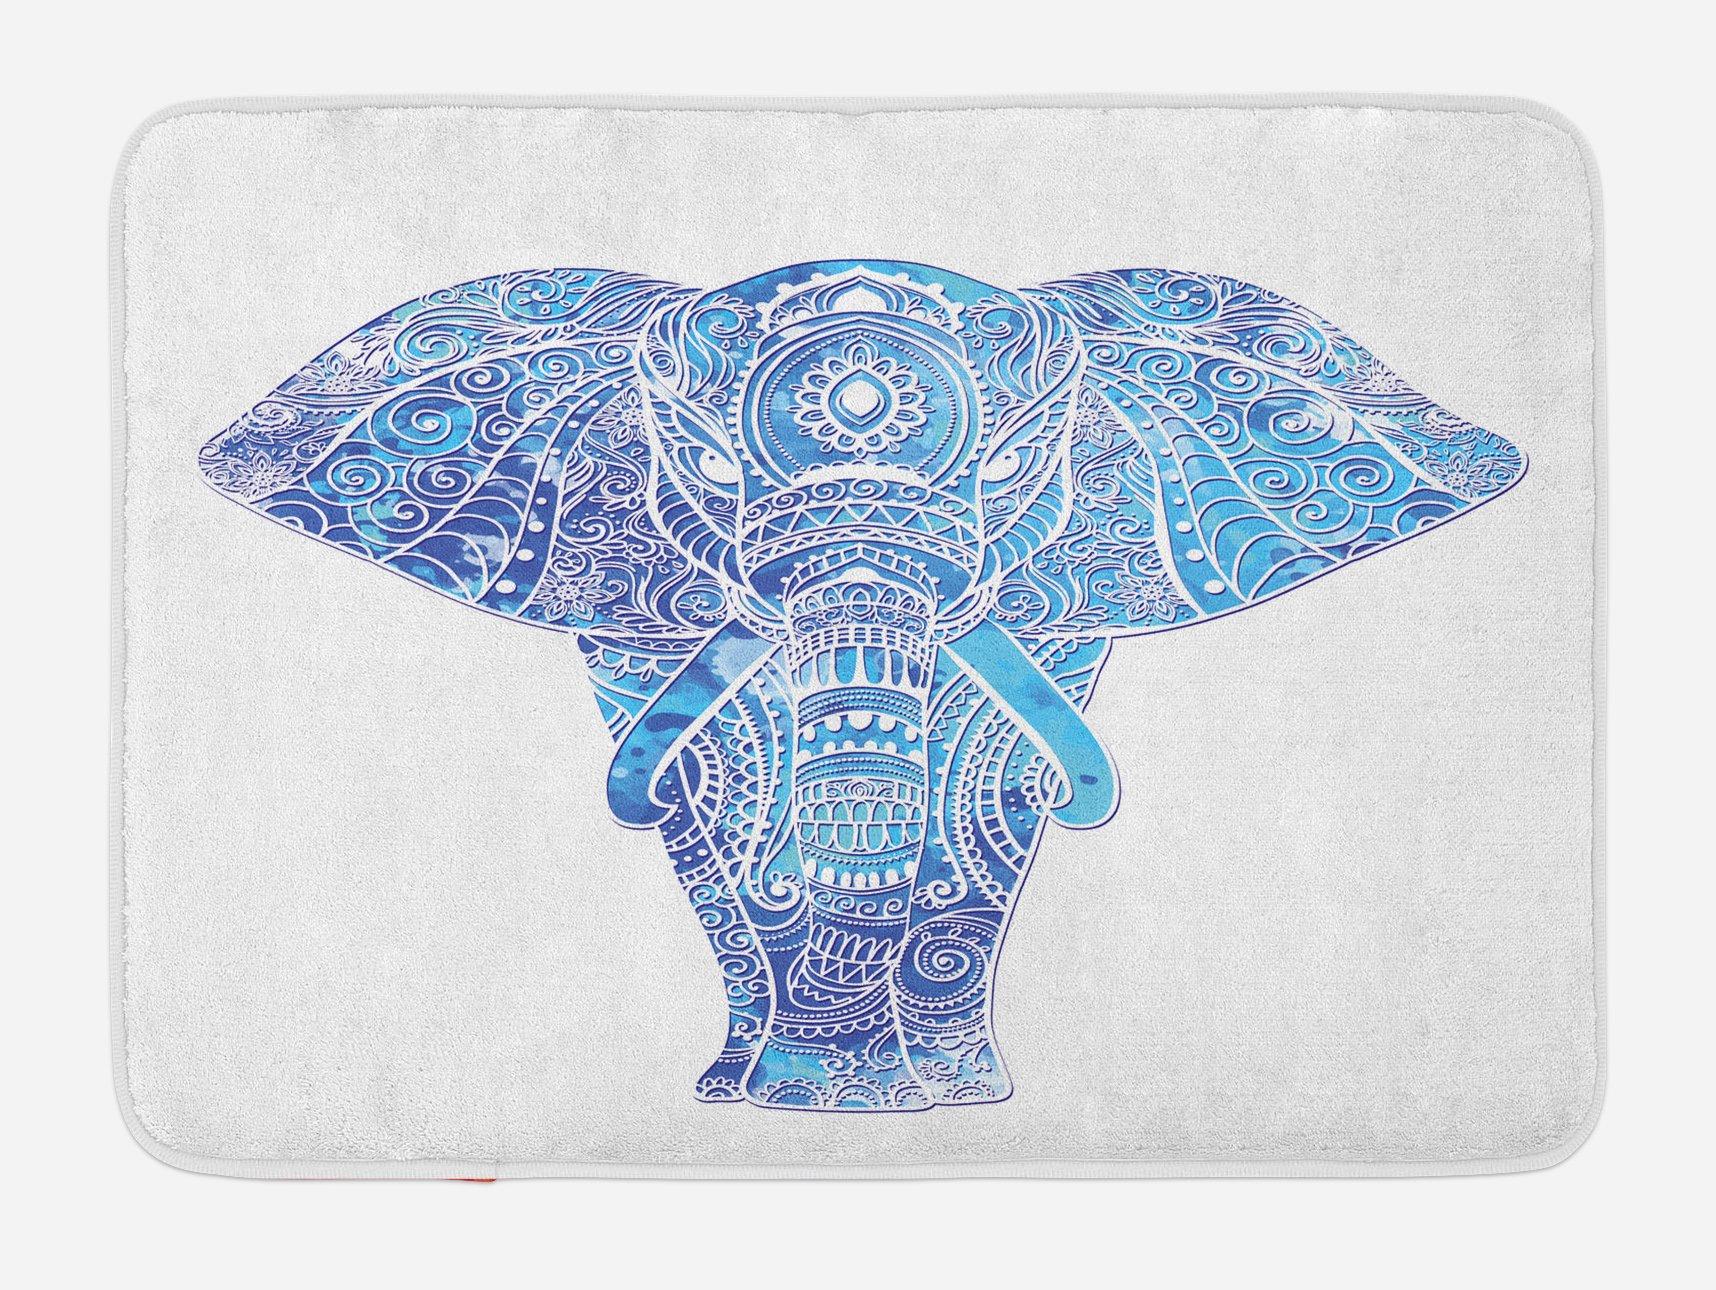 Lunarable Elephant Mandala Bath Mat, Ocean Sea Inspired Colored Ethnic Sacred Animal Image, Plush Bathroom Decor Mat with Non Slip Backing, 29.5 W X 17.5 W Inches, Aqua Pale Blue and Turquoise